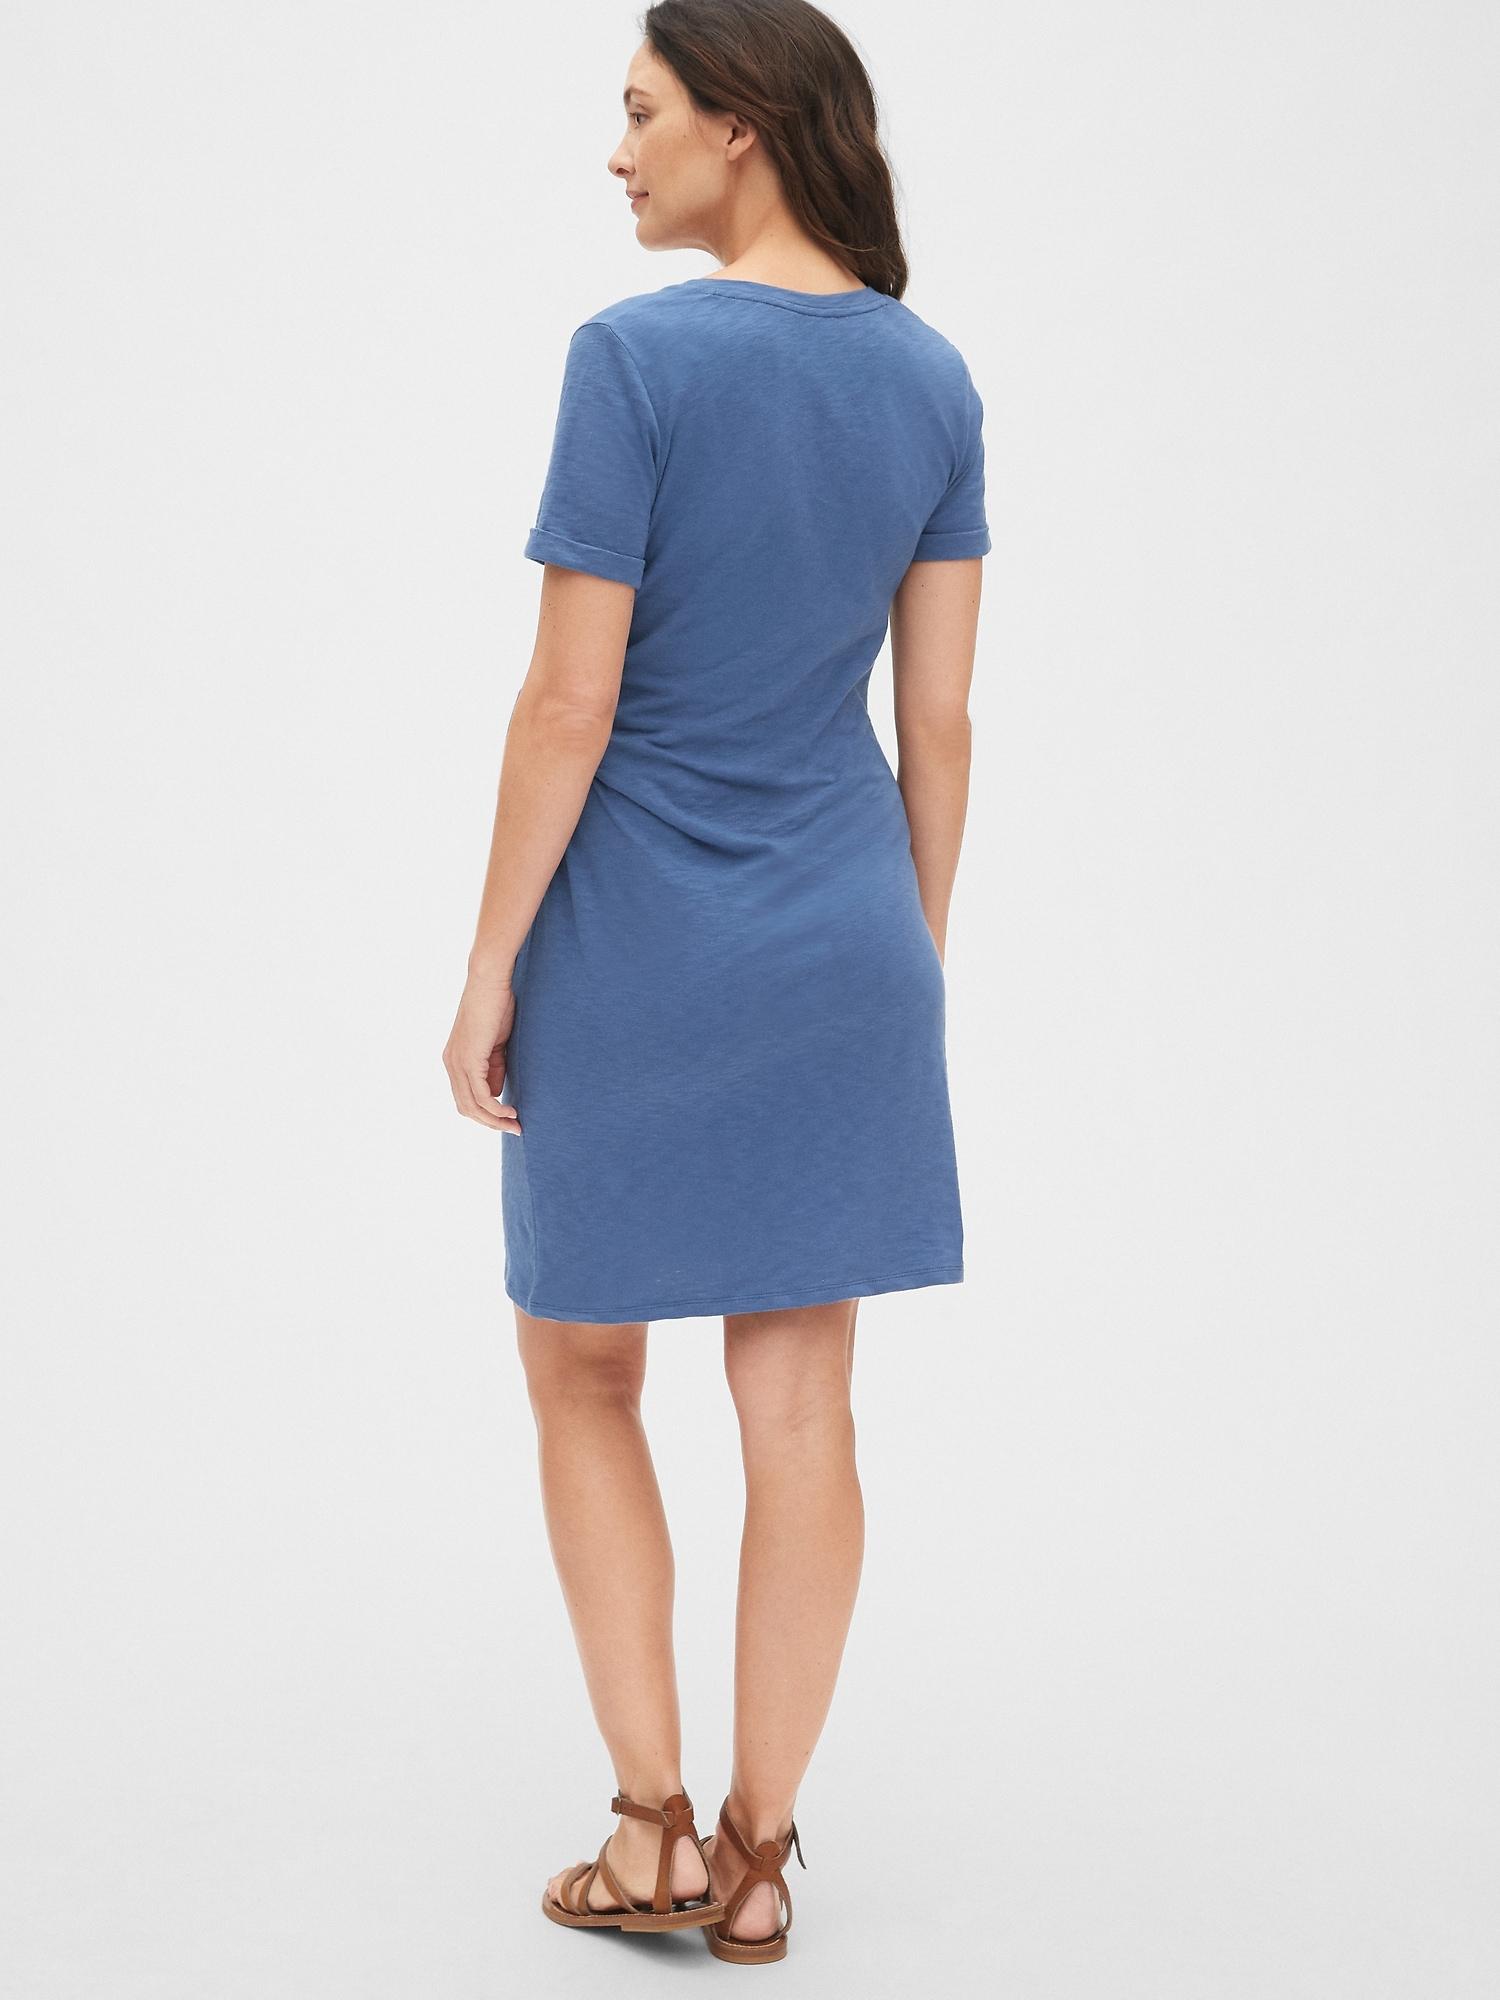 7d4c3cc617e Maternity Side-Tie V-Neck T-Shirt Dress